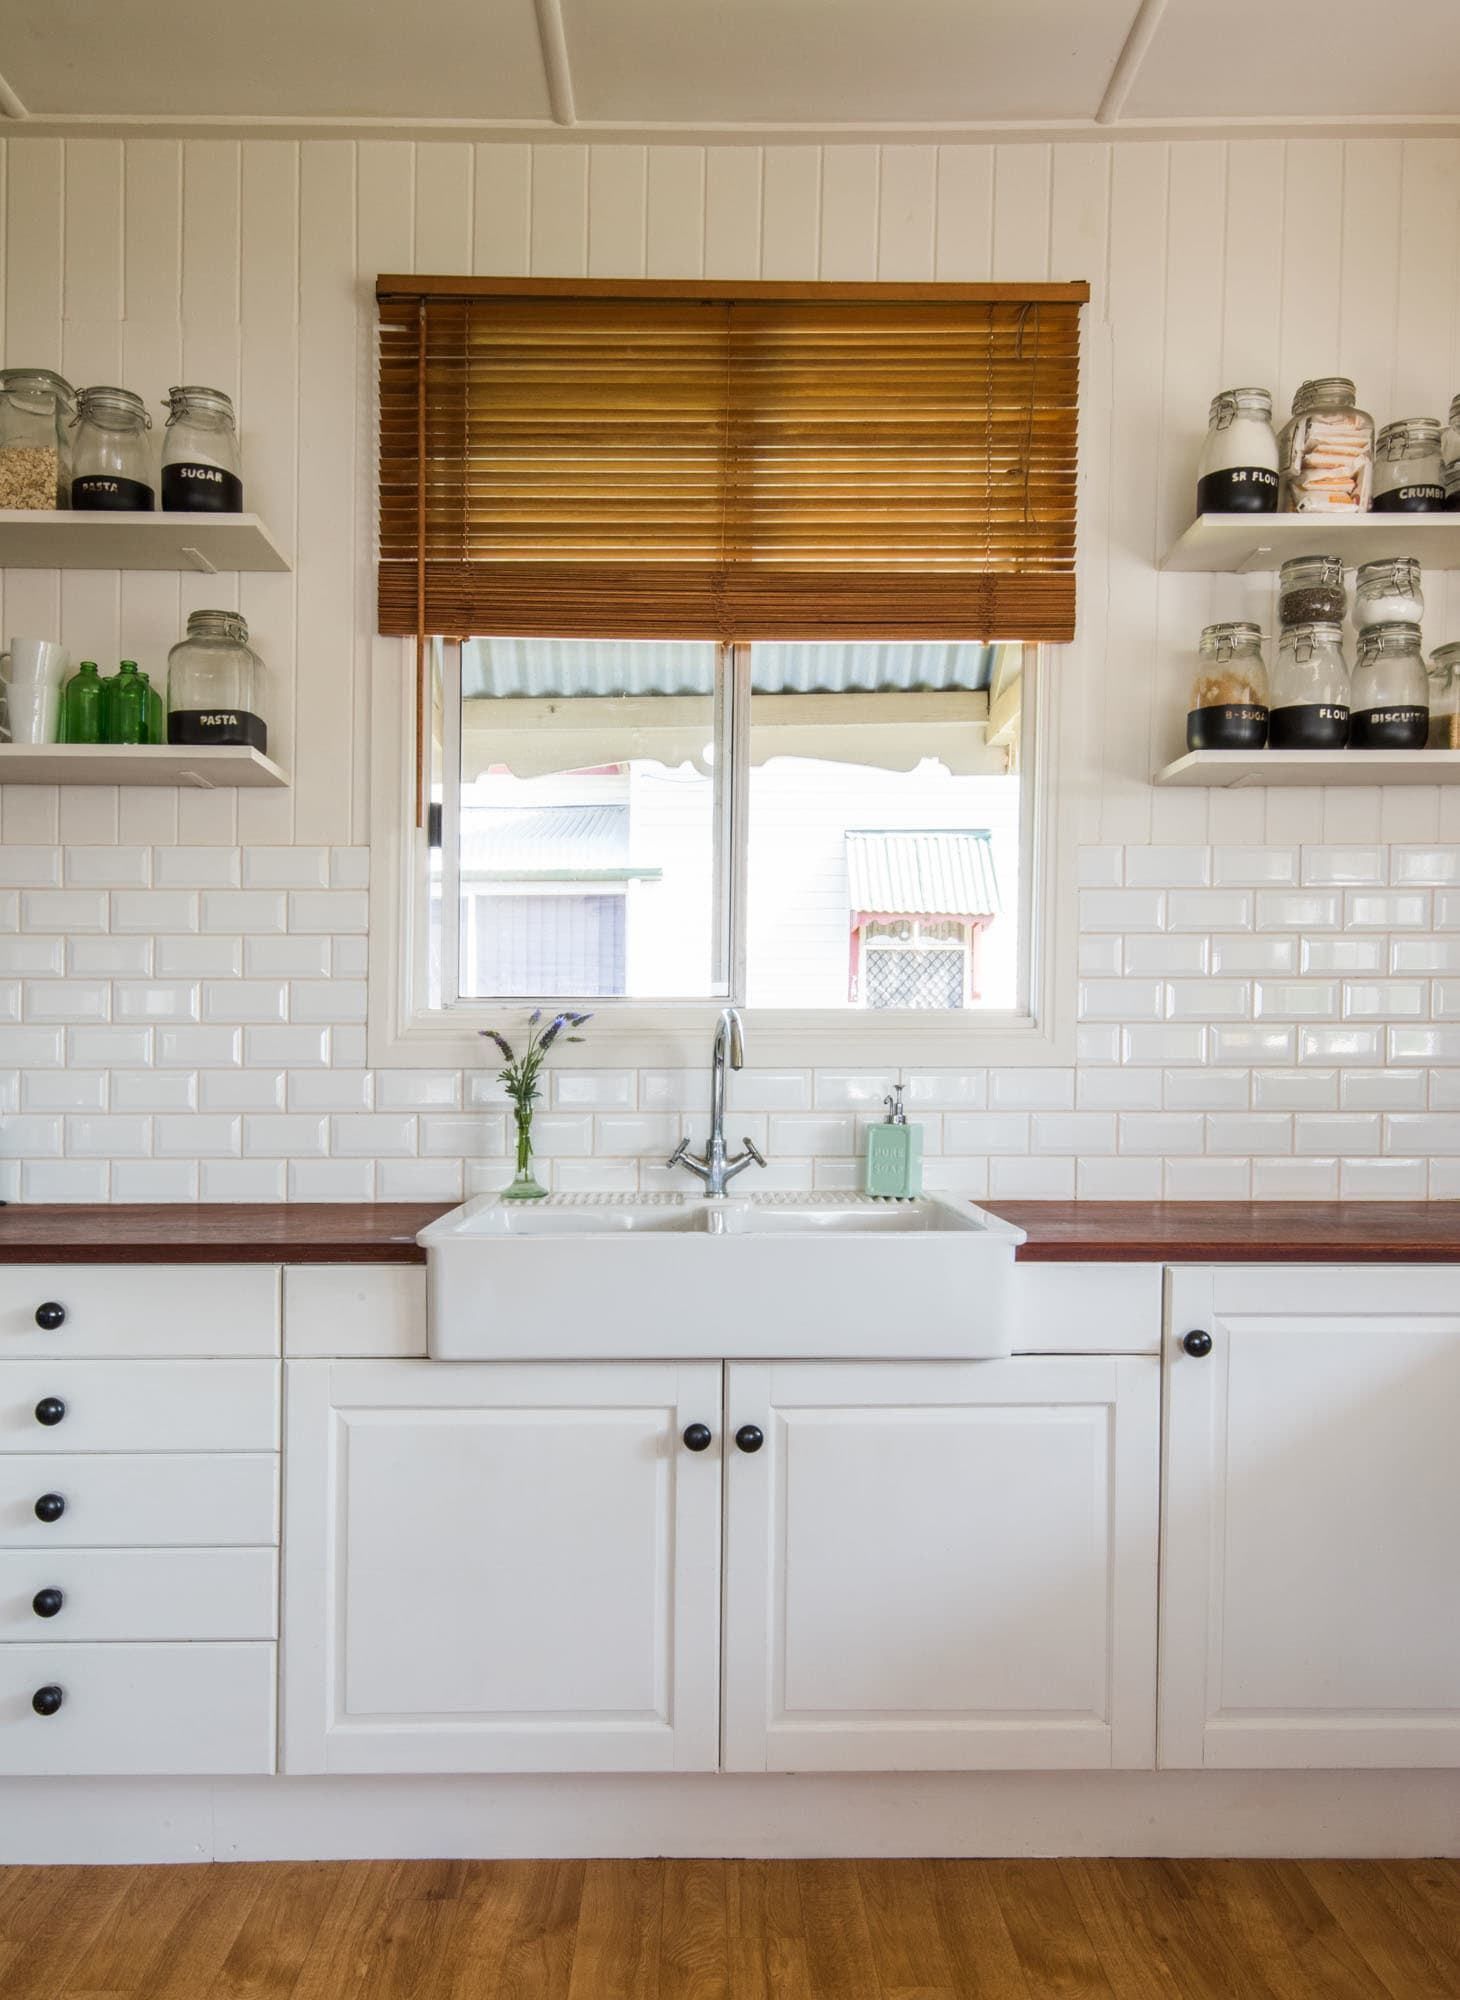 Corner window kitchen sink  house tour a traditional